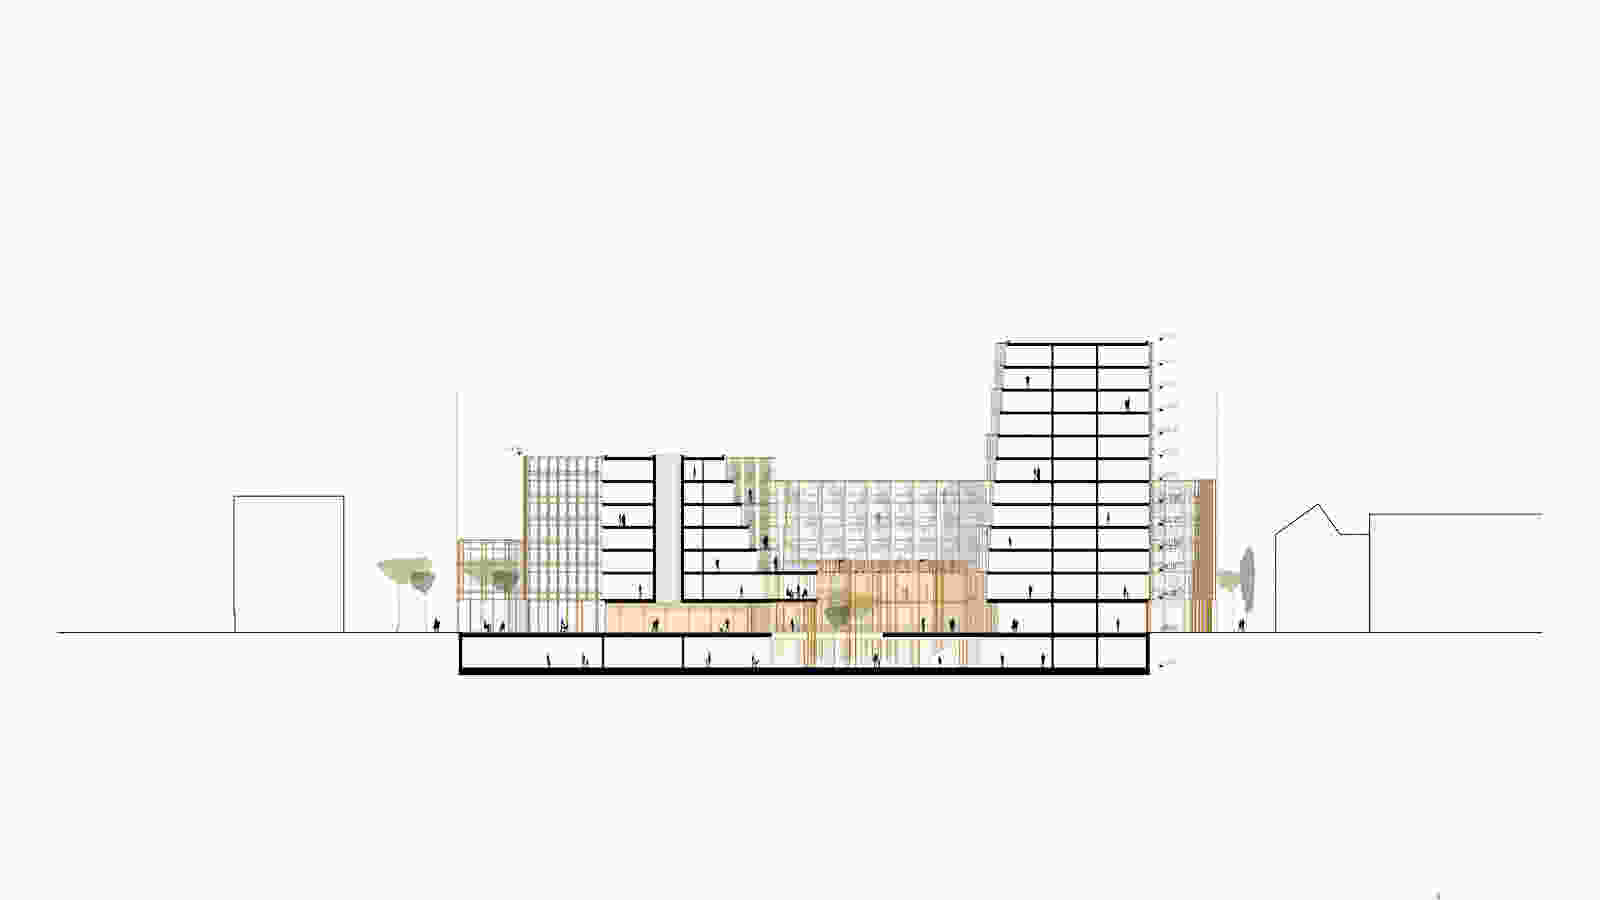 481 dmaa NE Umarkt Bielefeld plan 03 section B B